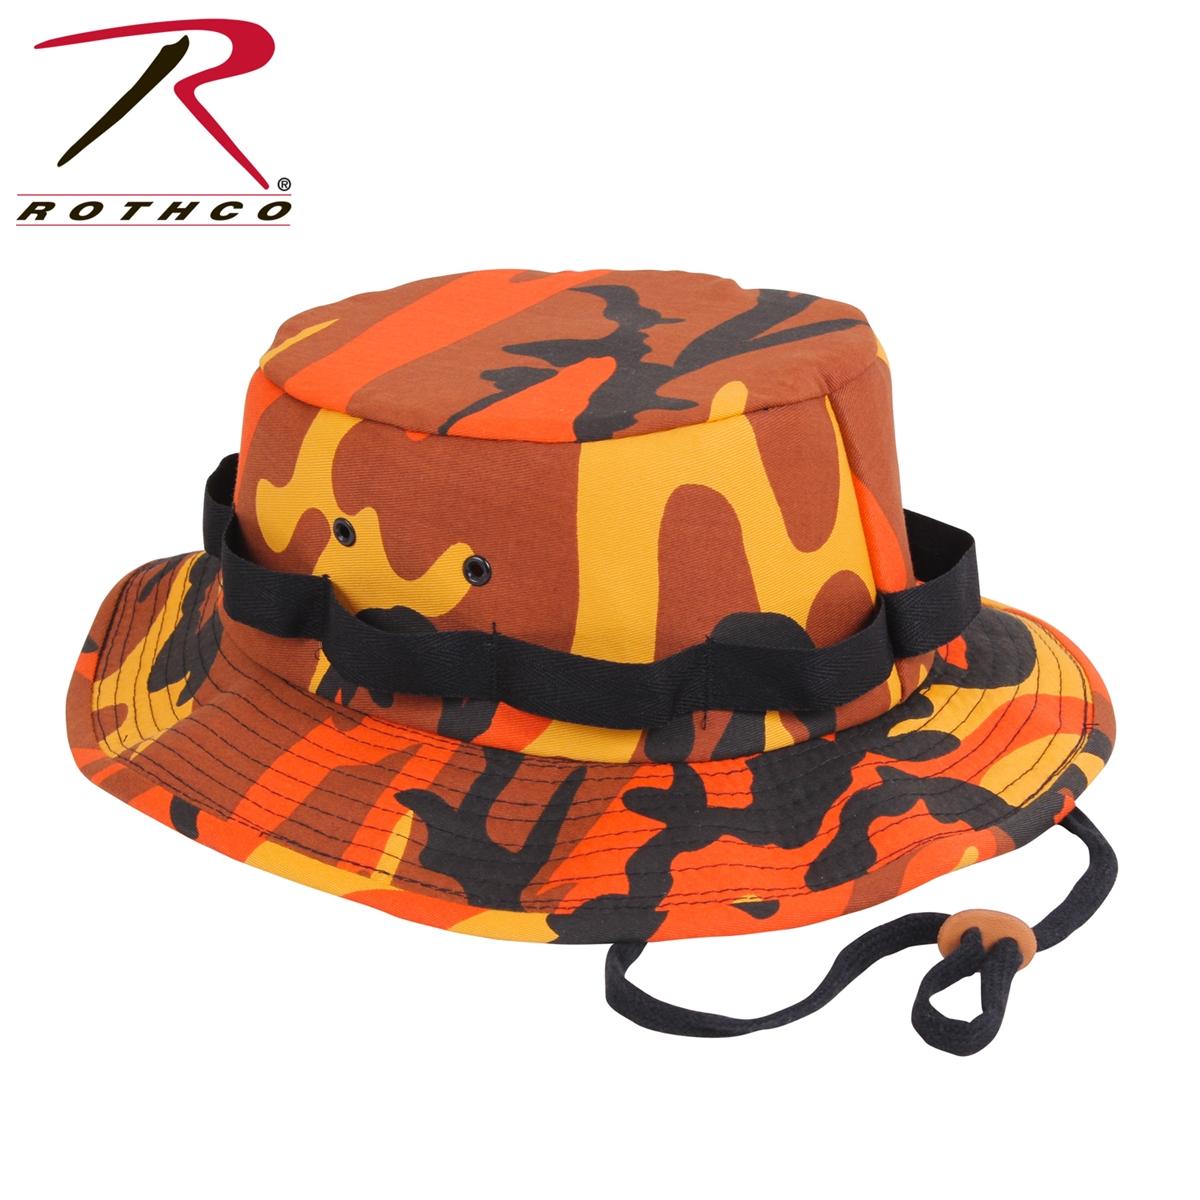 Rothco Camo Jungle Hat - Savage Orange · Larger Photo eb20317ff40